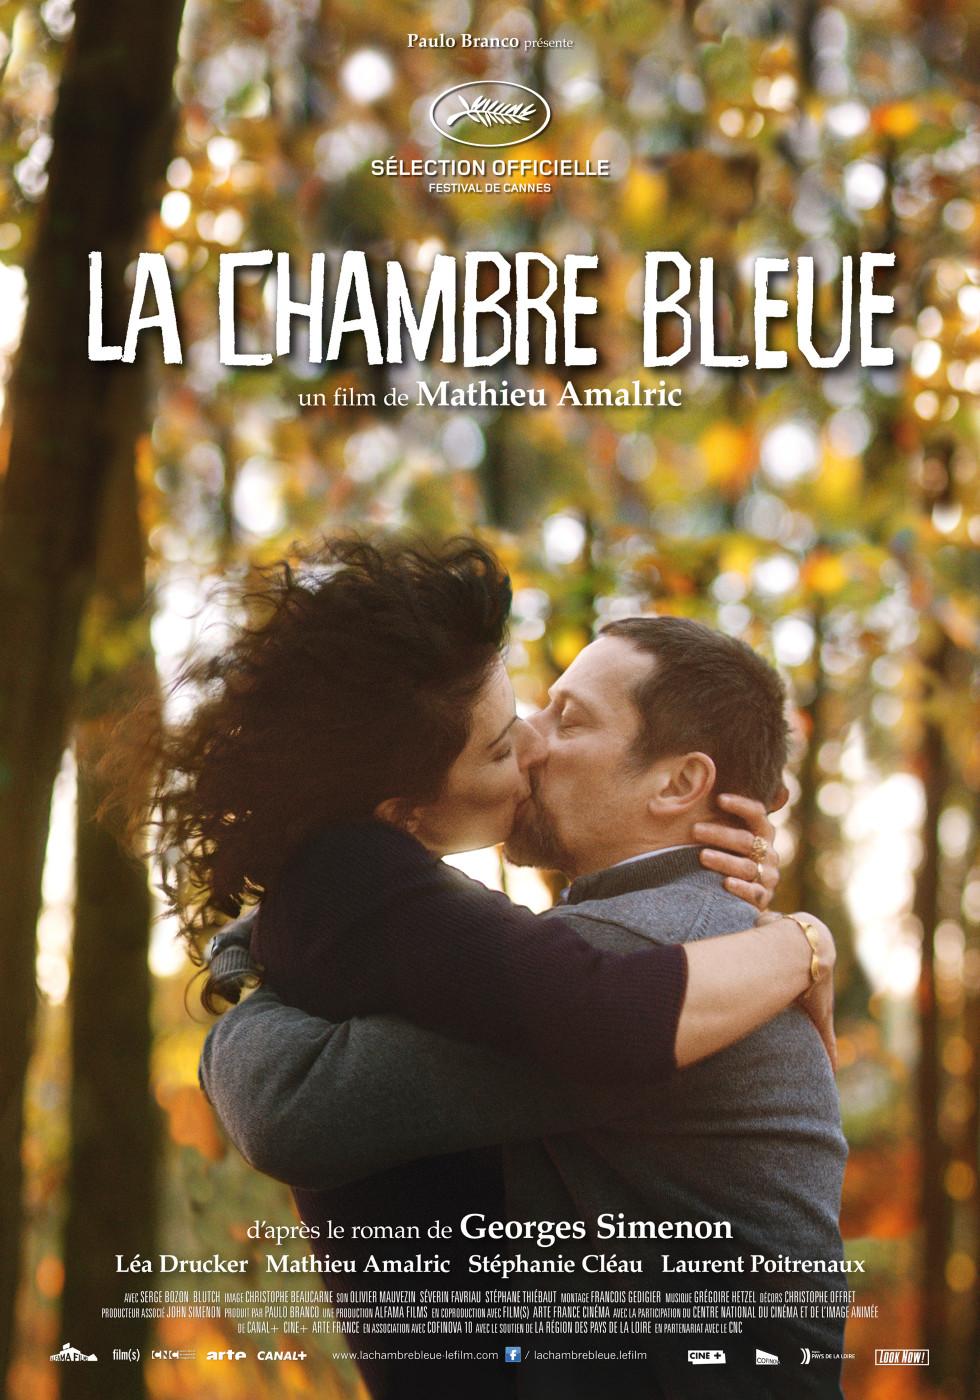 2014 for Chambre 13 film